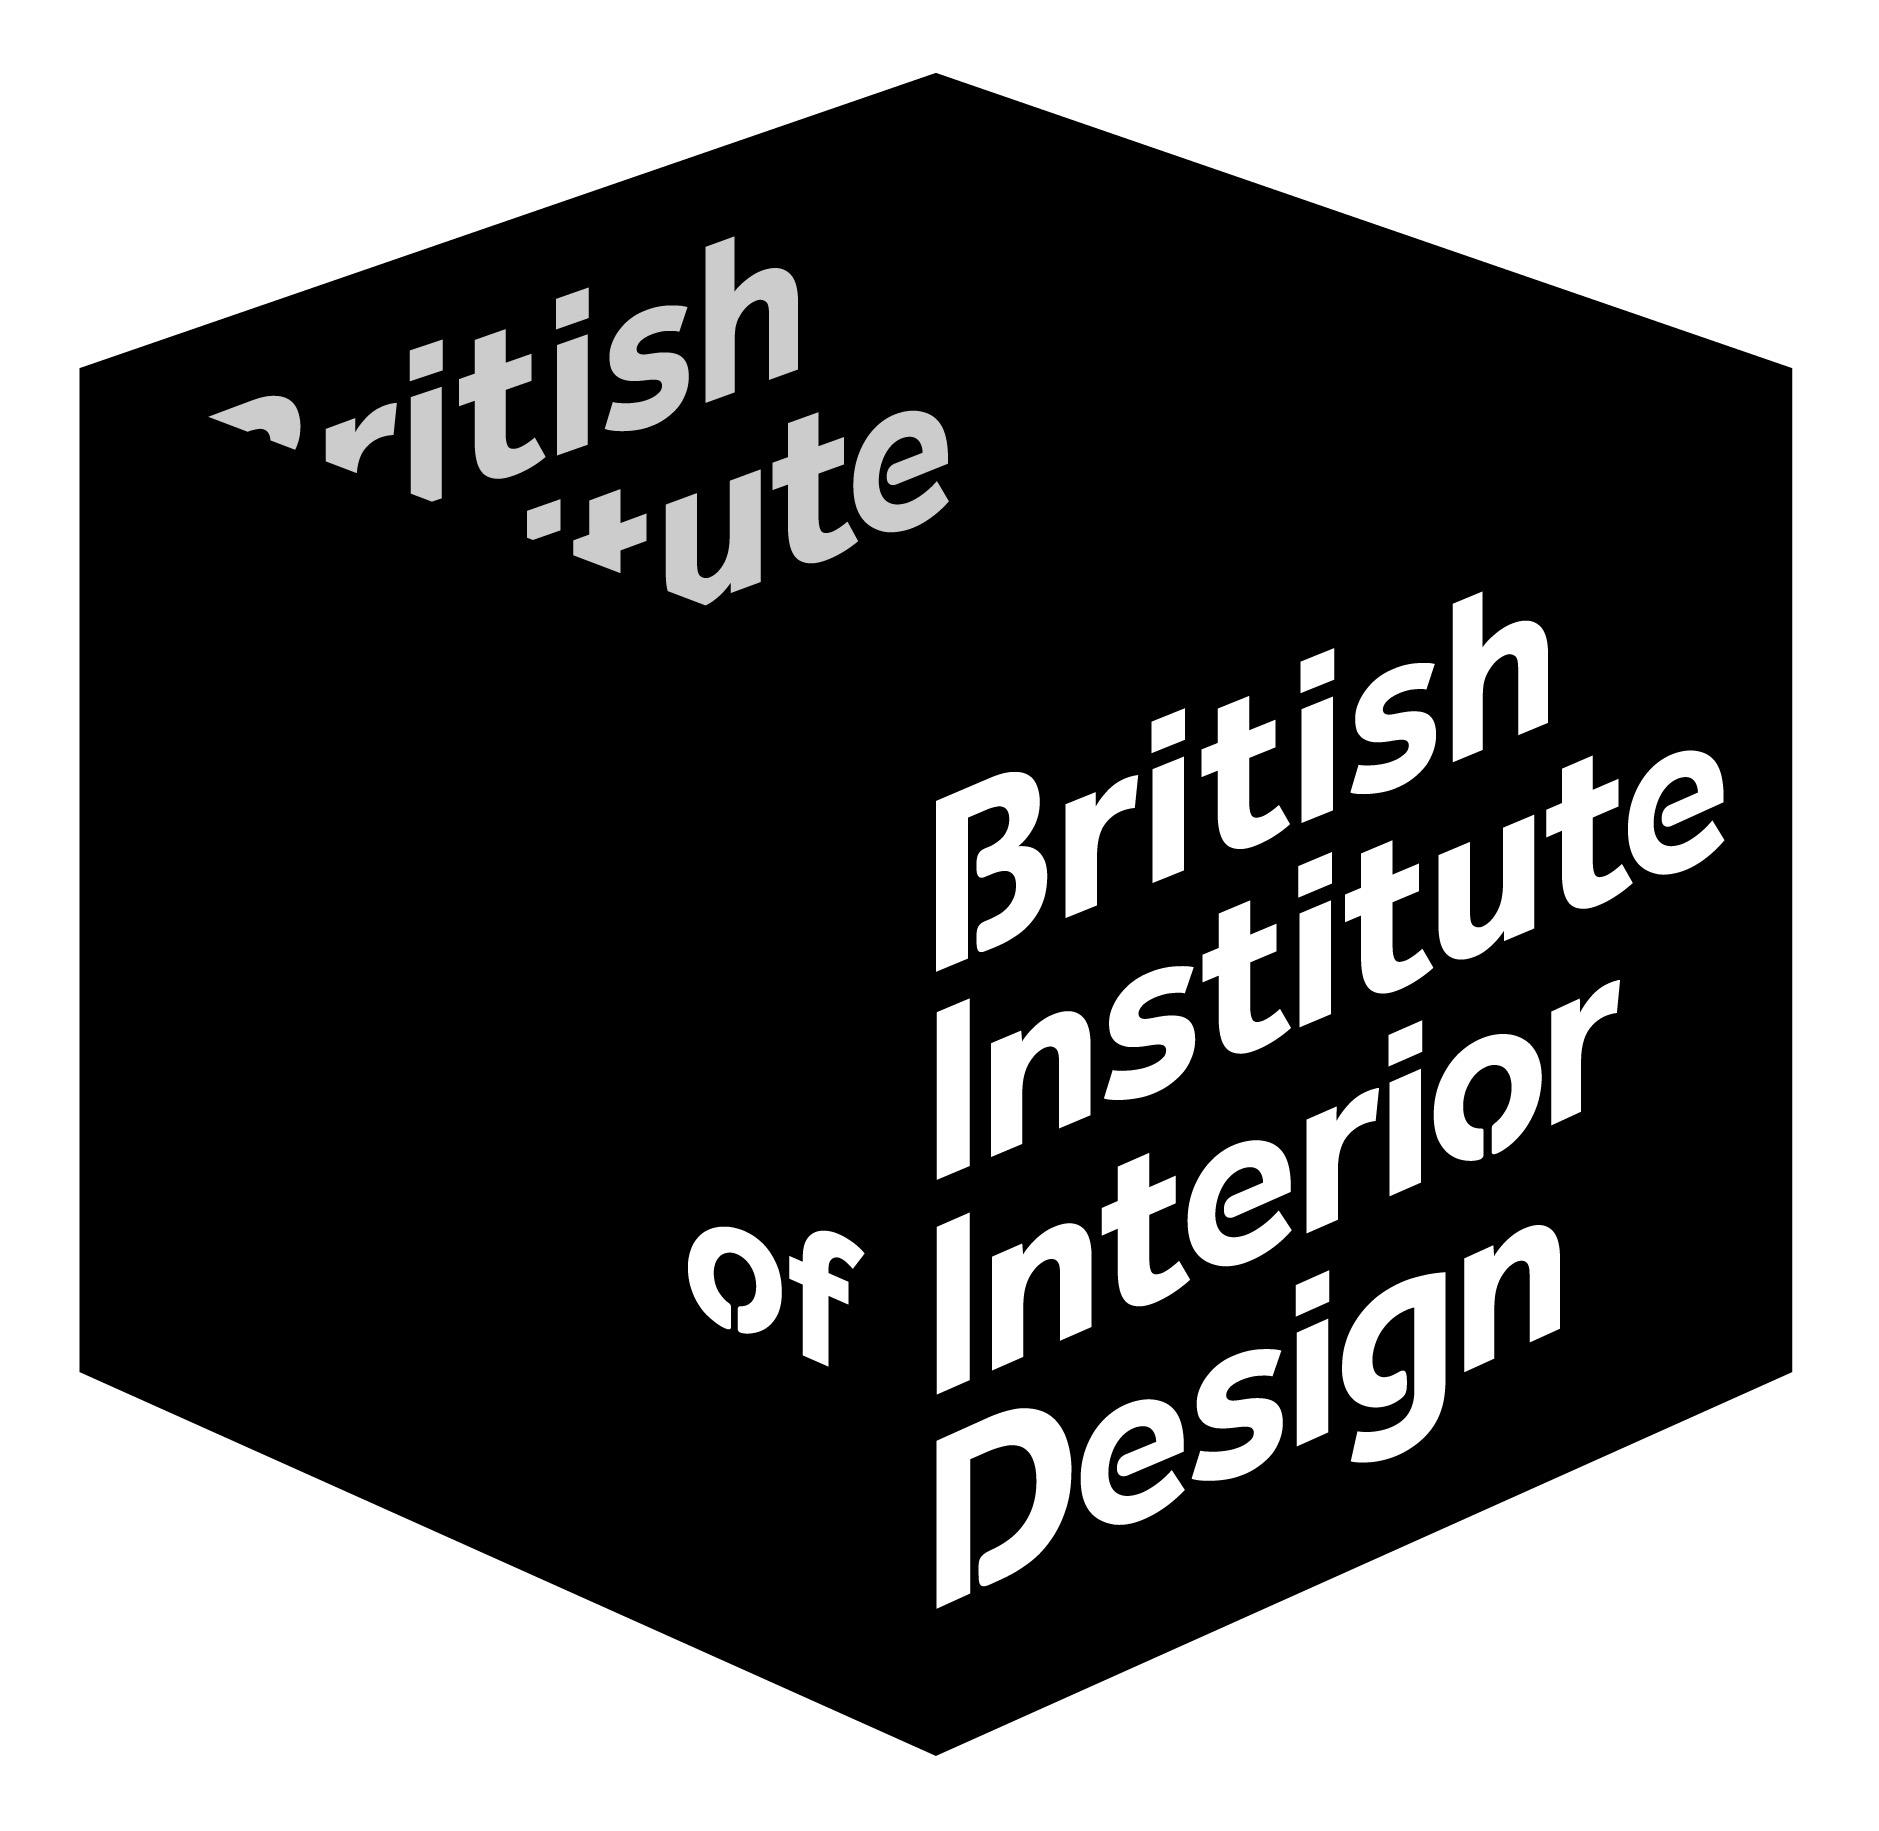 Speaking at The British Institute of Interior Design Business Success Conference